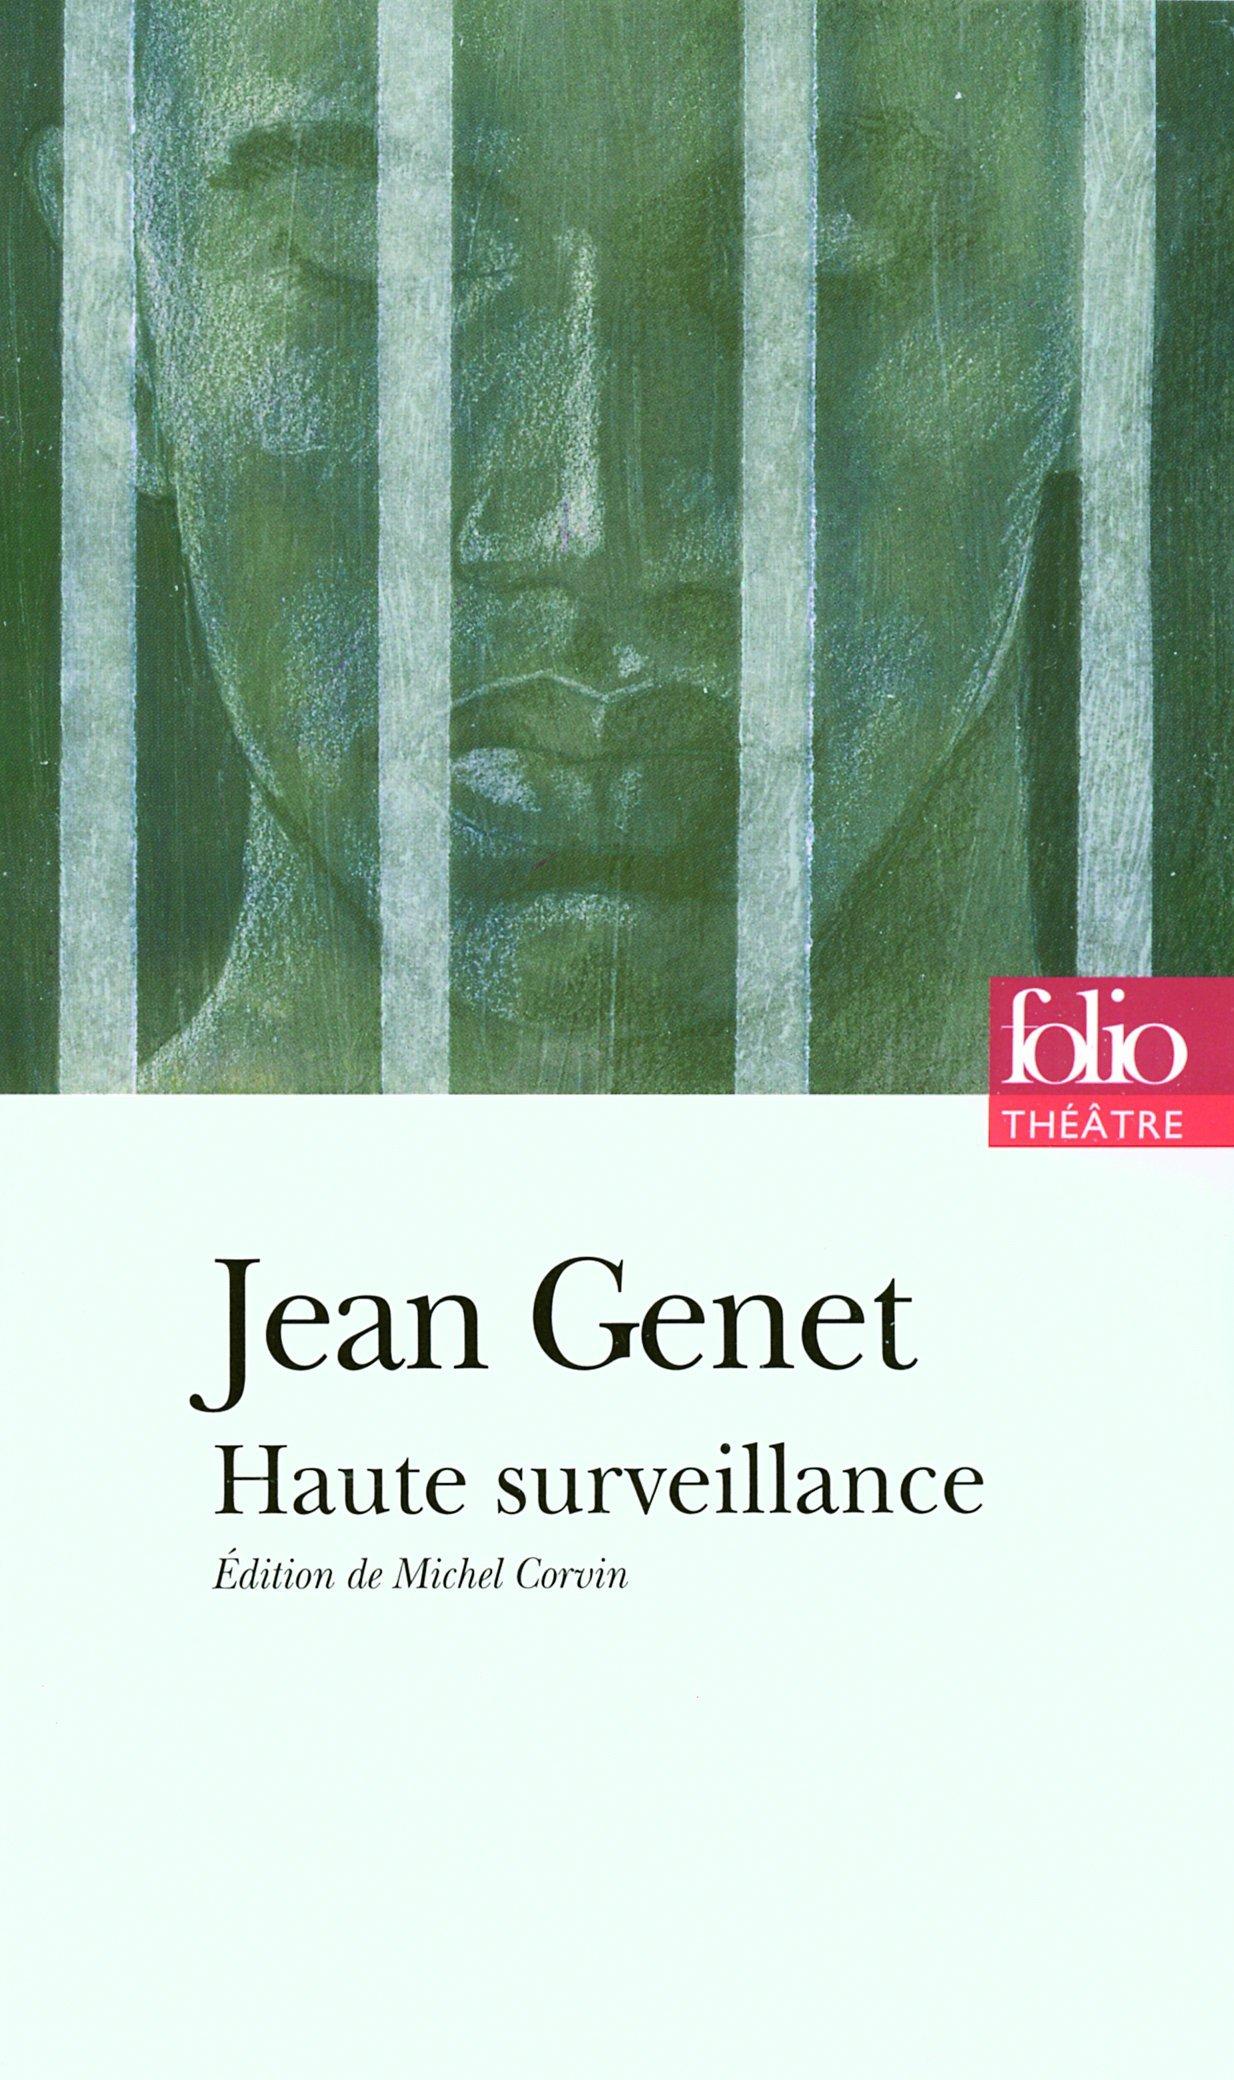 Haute surveillance Jean Genet